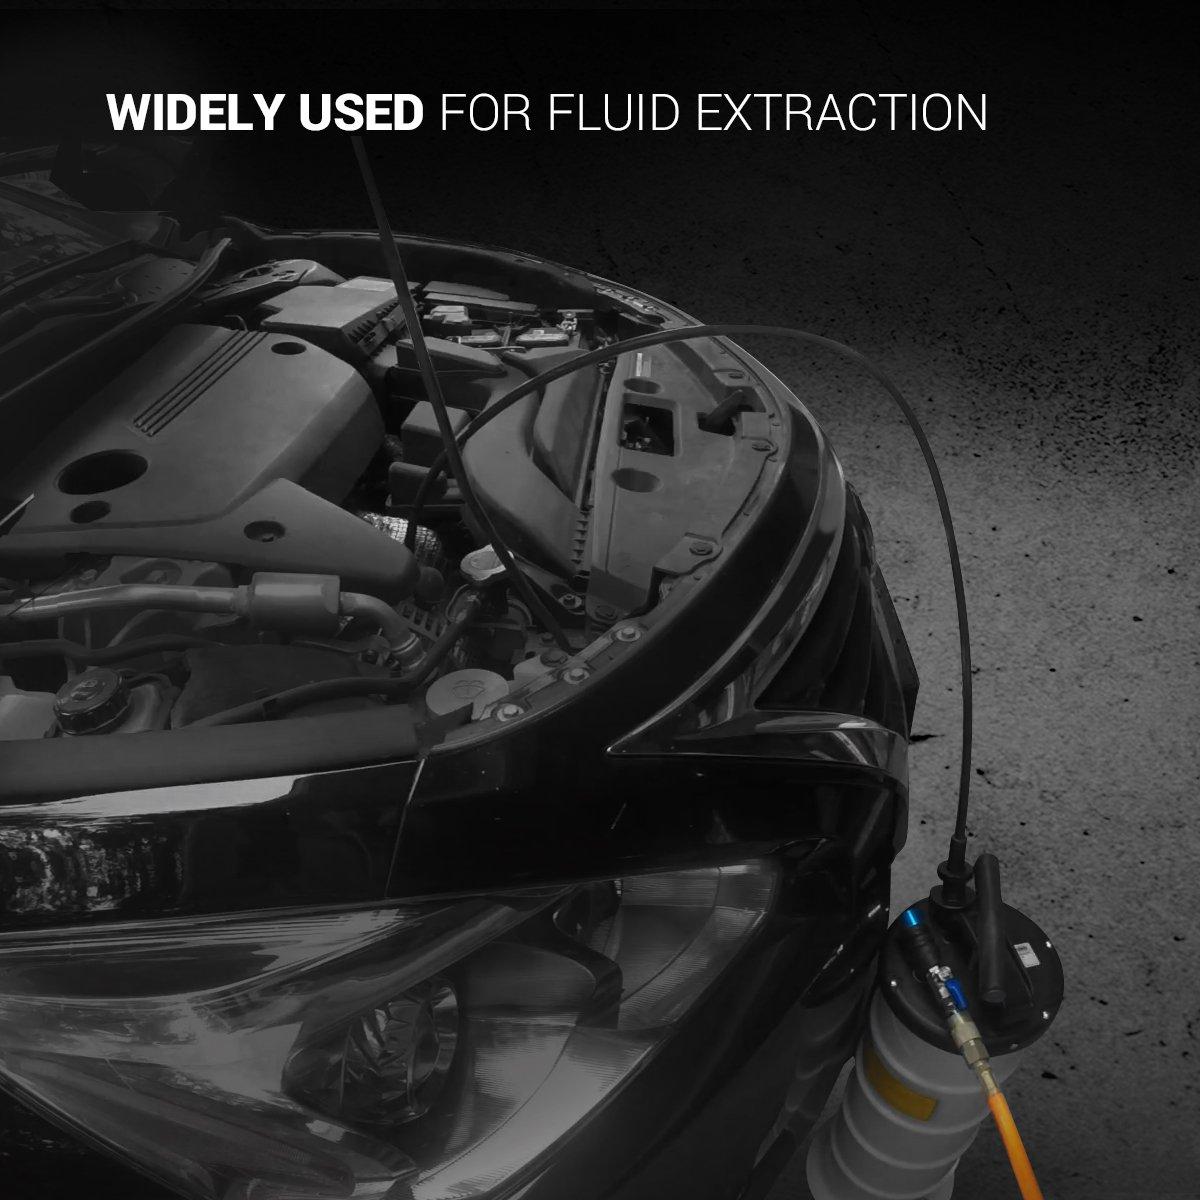 EWK Pneumatic / Manual 15 Liter Oil Changer Vacuum Fluid Extractor Pump Tank Remover by EWK (Image #4)